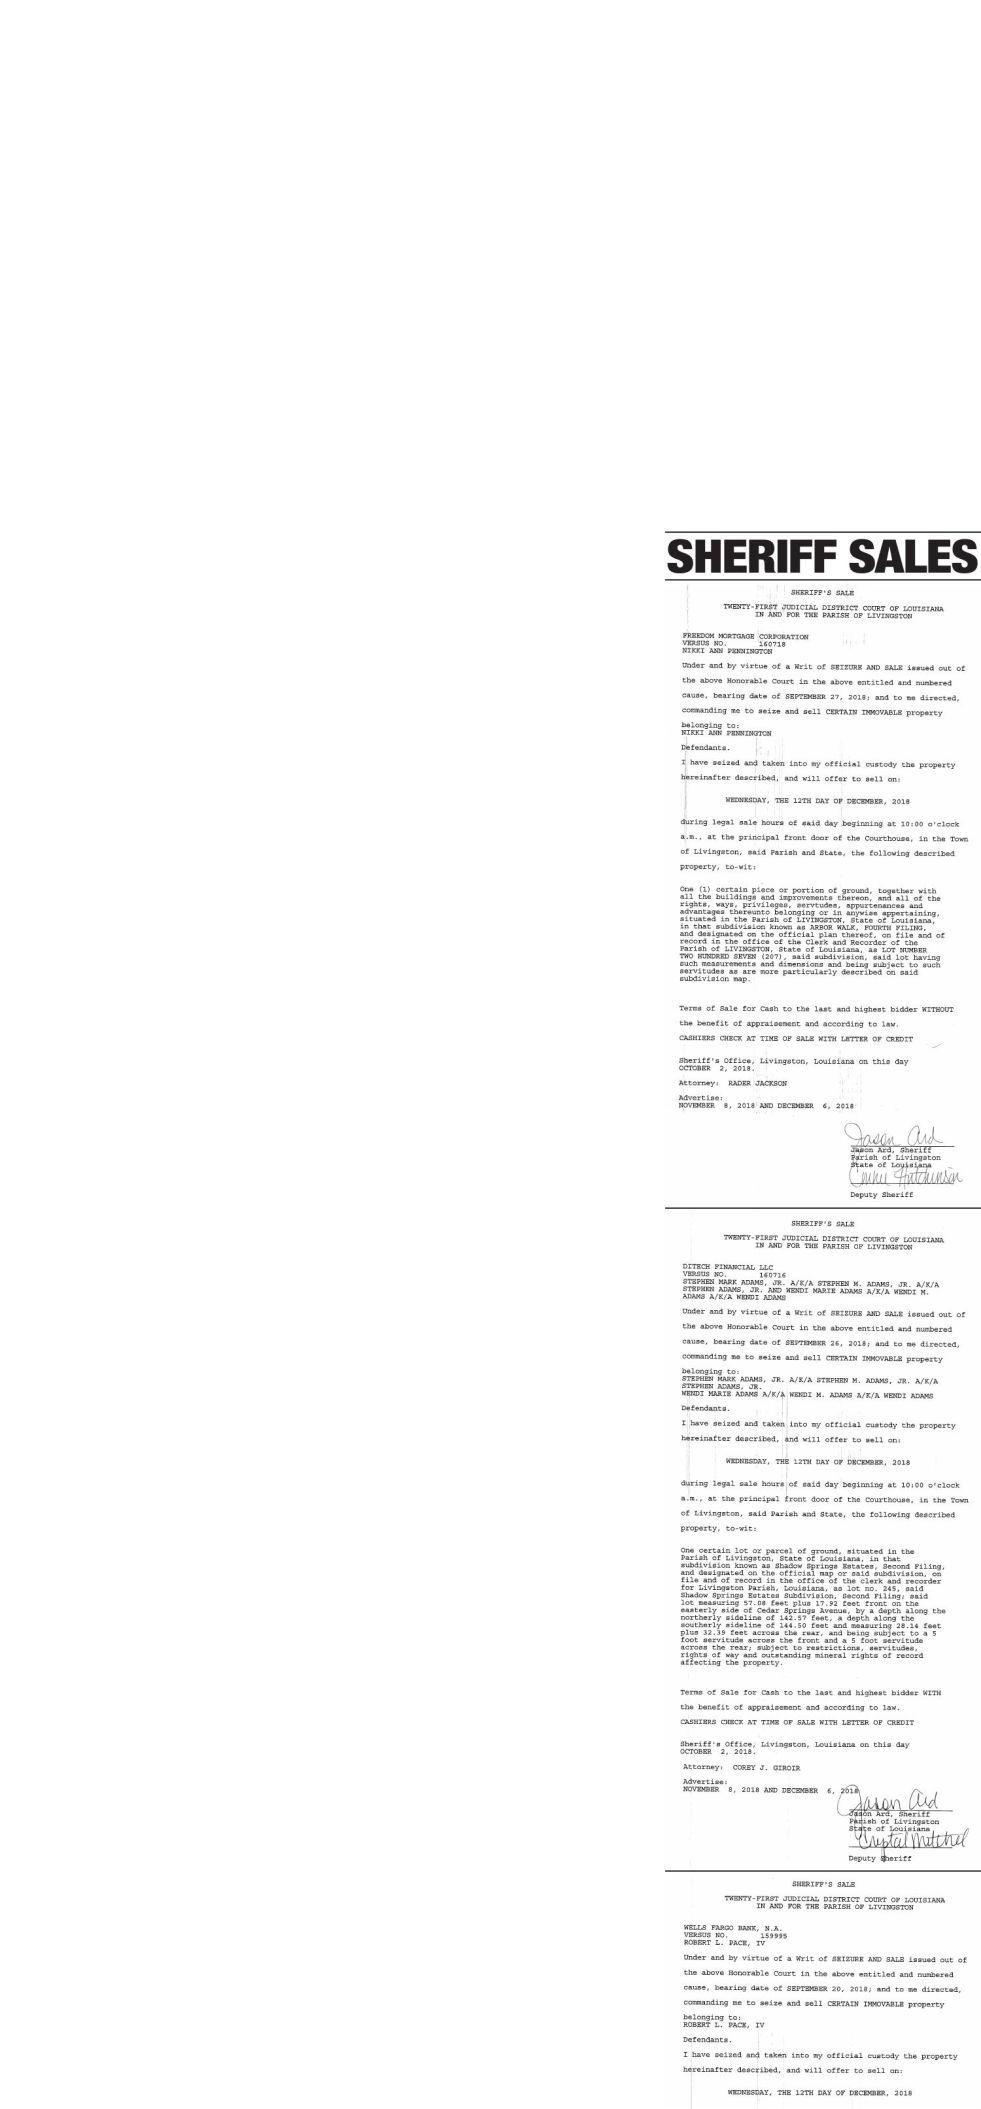 Public Notices published November 8, 2018